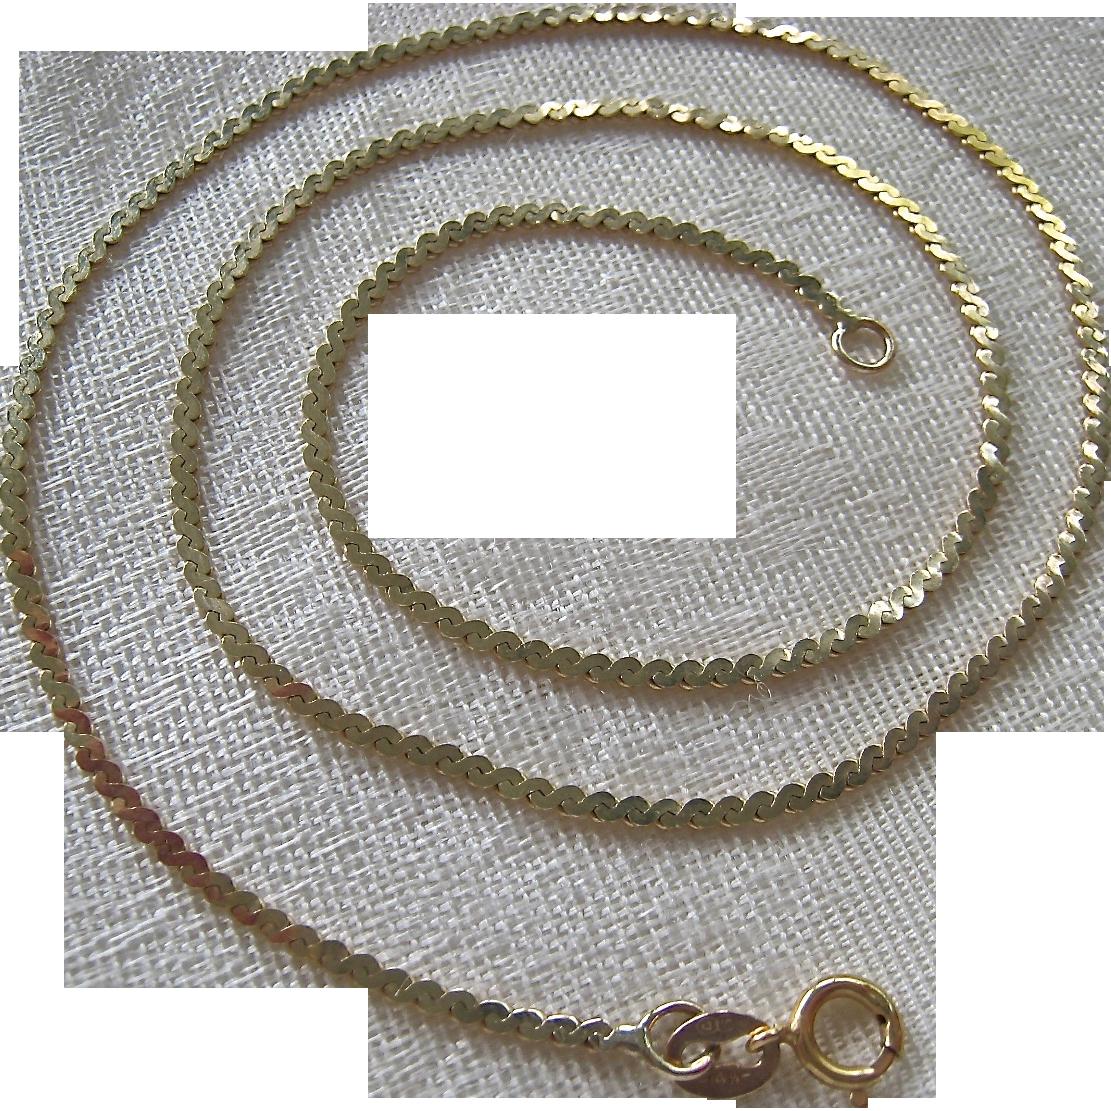 14k Gold Serpentine Chain Necklace From Susabellas On Ruby. Ruby Red Gemstone. Light Blue Sapphire. Cardiac Bracelet. Hindi Bracelet. Unique Gold Bracelet. Bar Earrings. Sterling Silver Diamond Bangle Bracelet. Bronze Stud Earrings